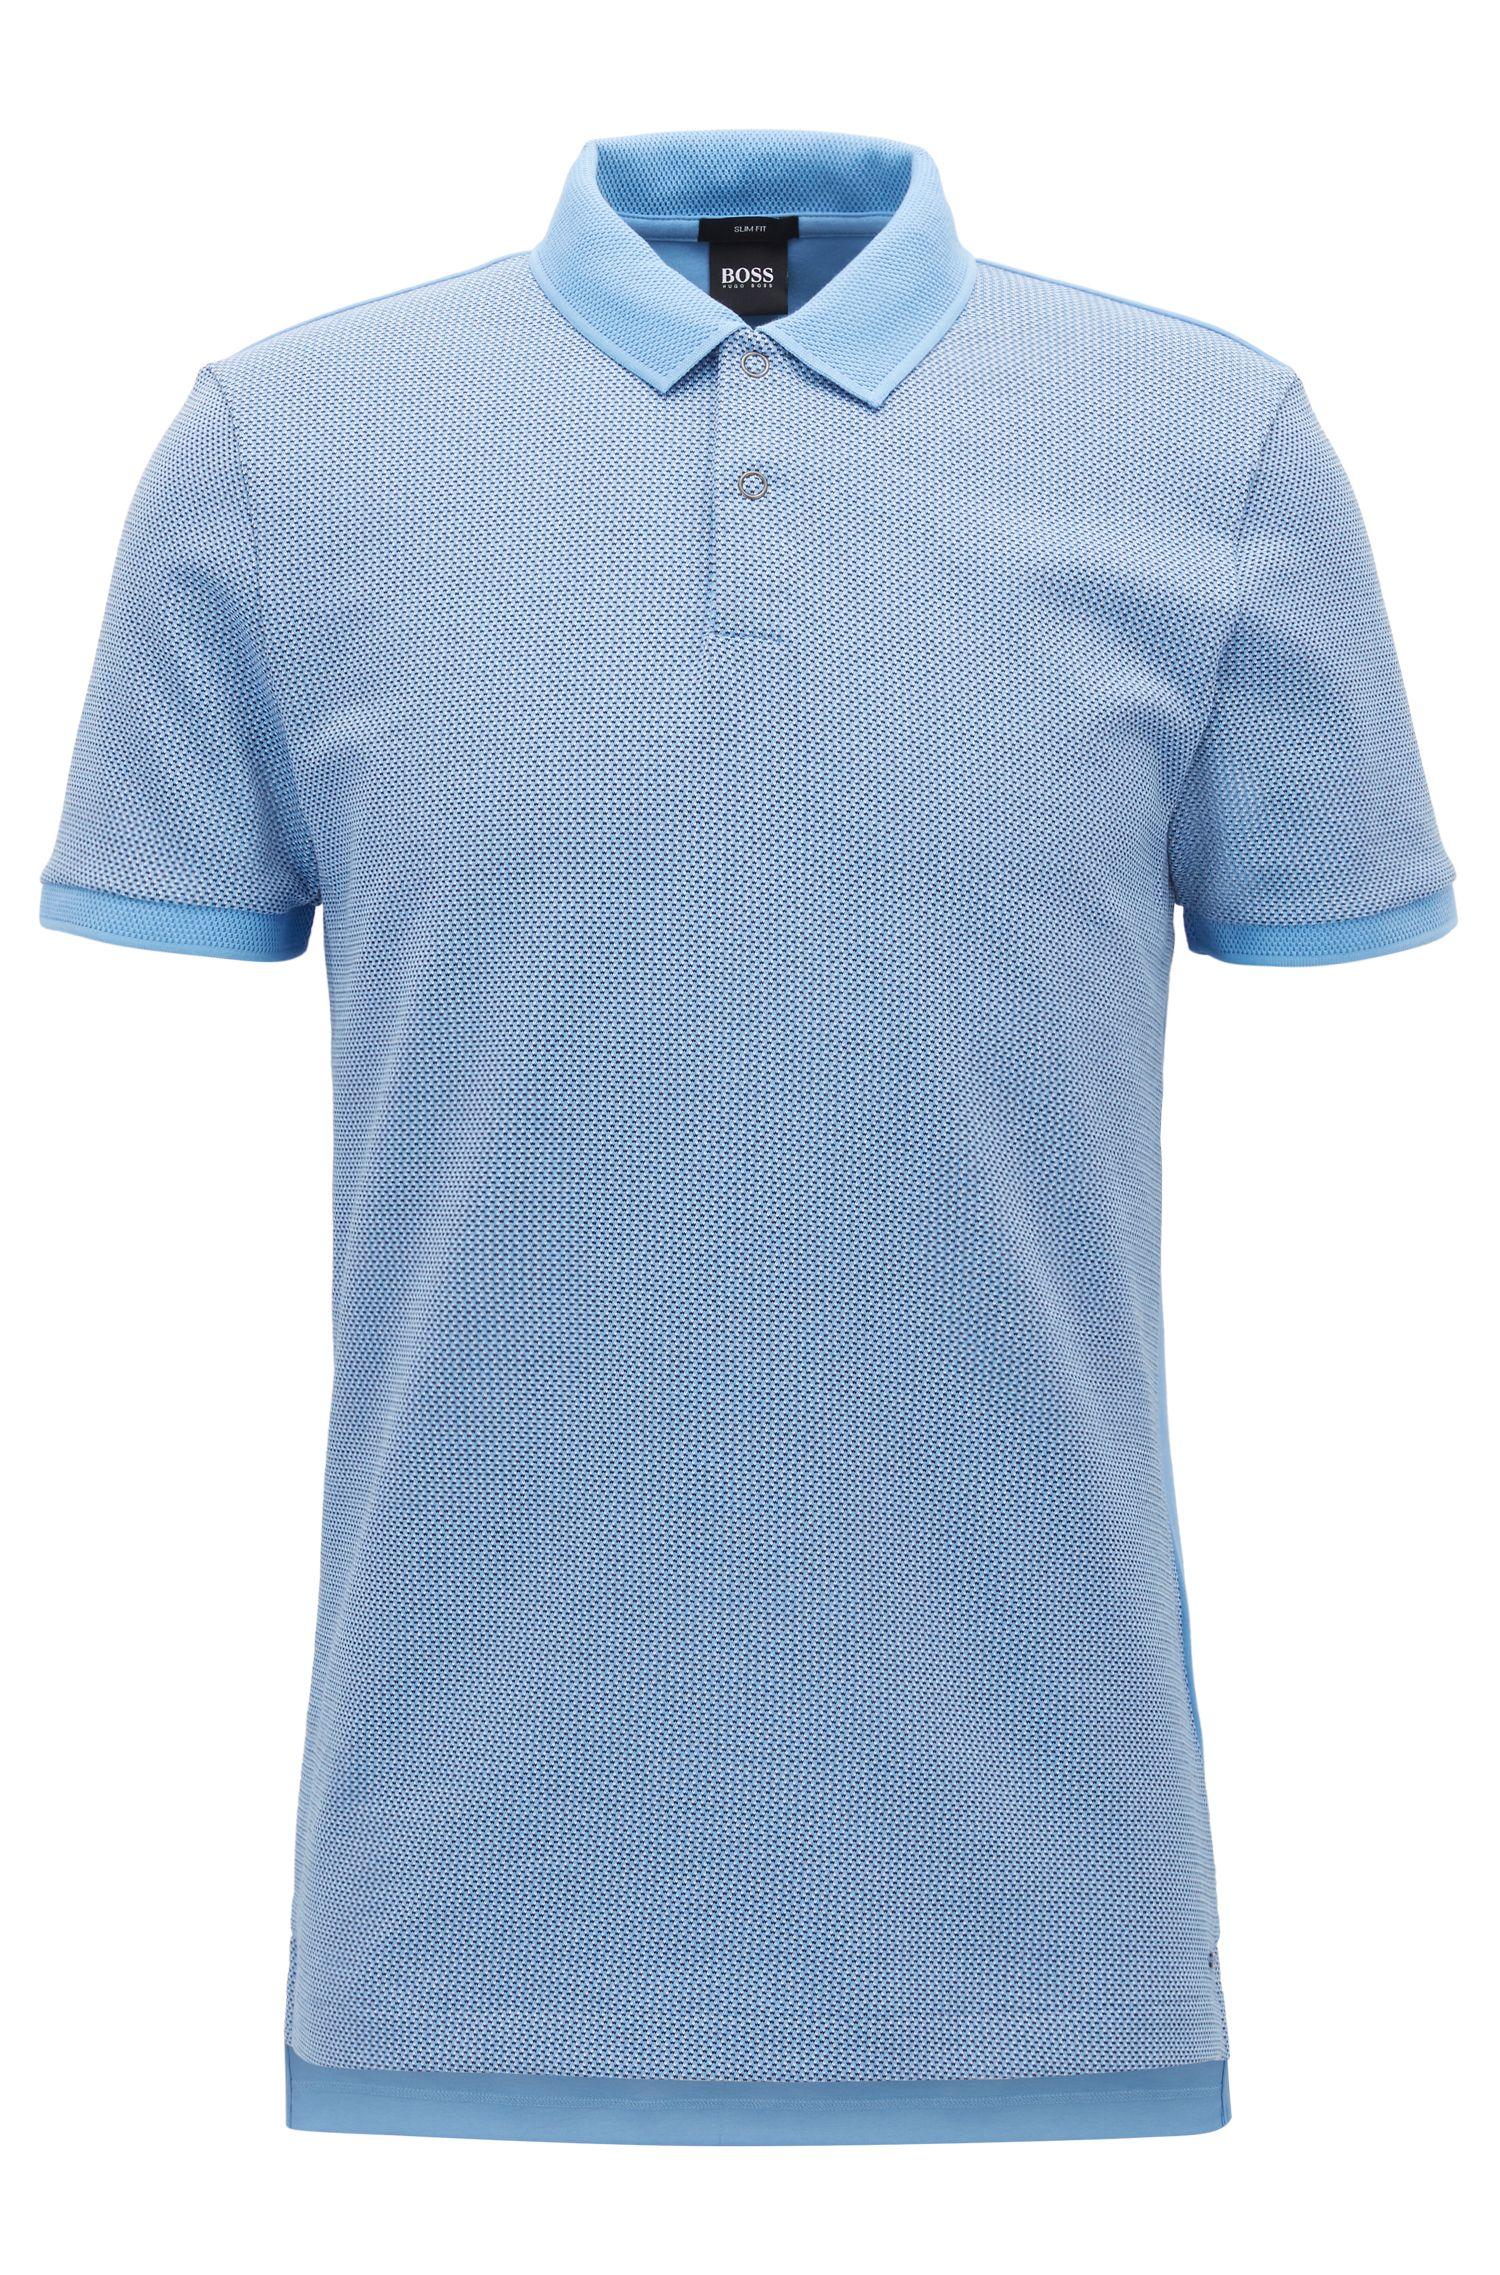 Poloshirt aus Baumwoll-Jacquard mit Birdseye-Muster